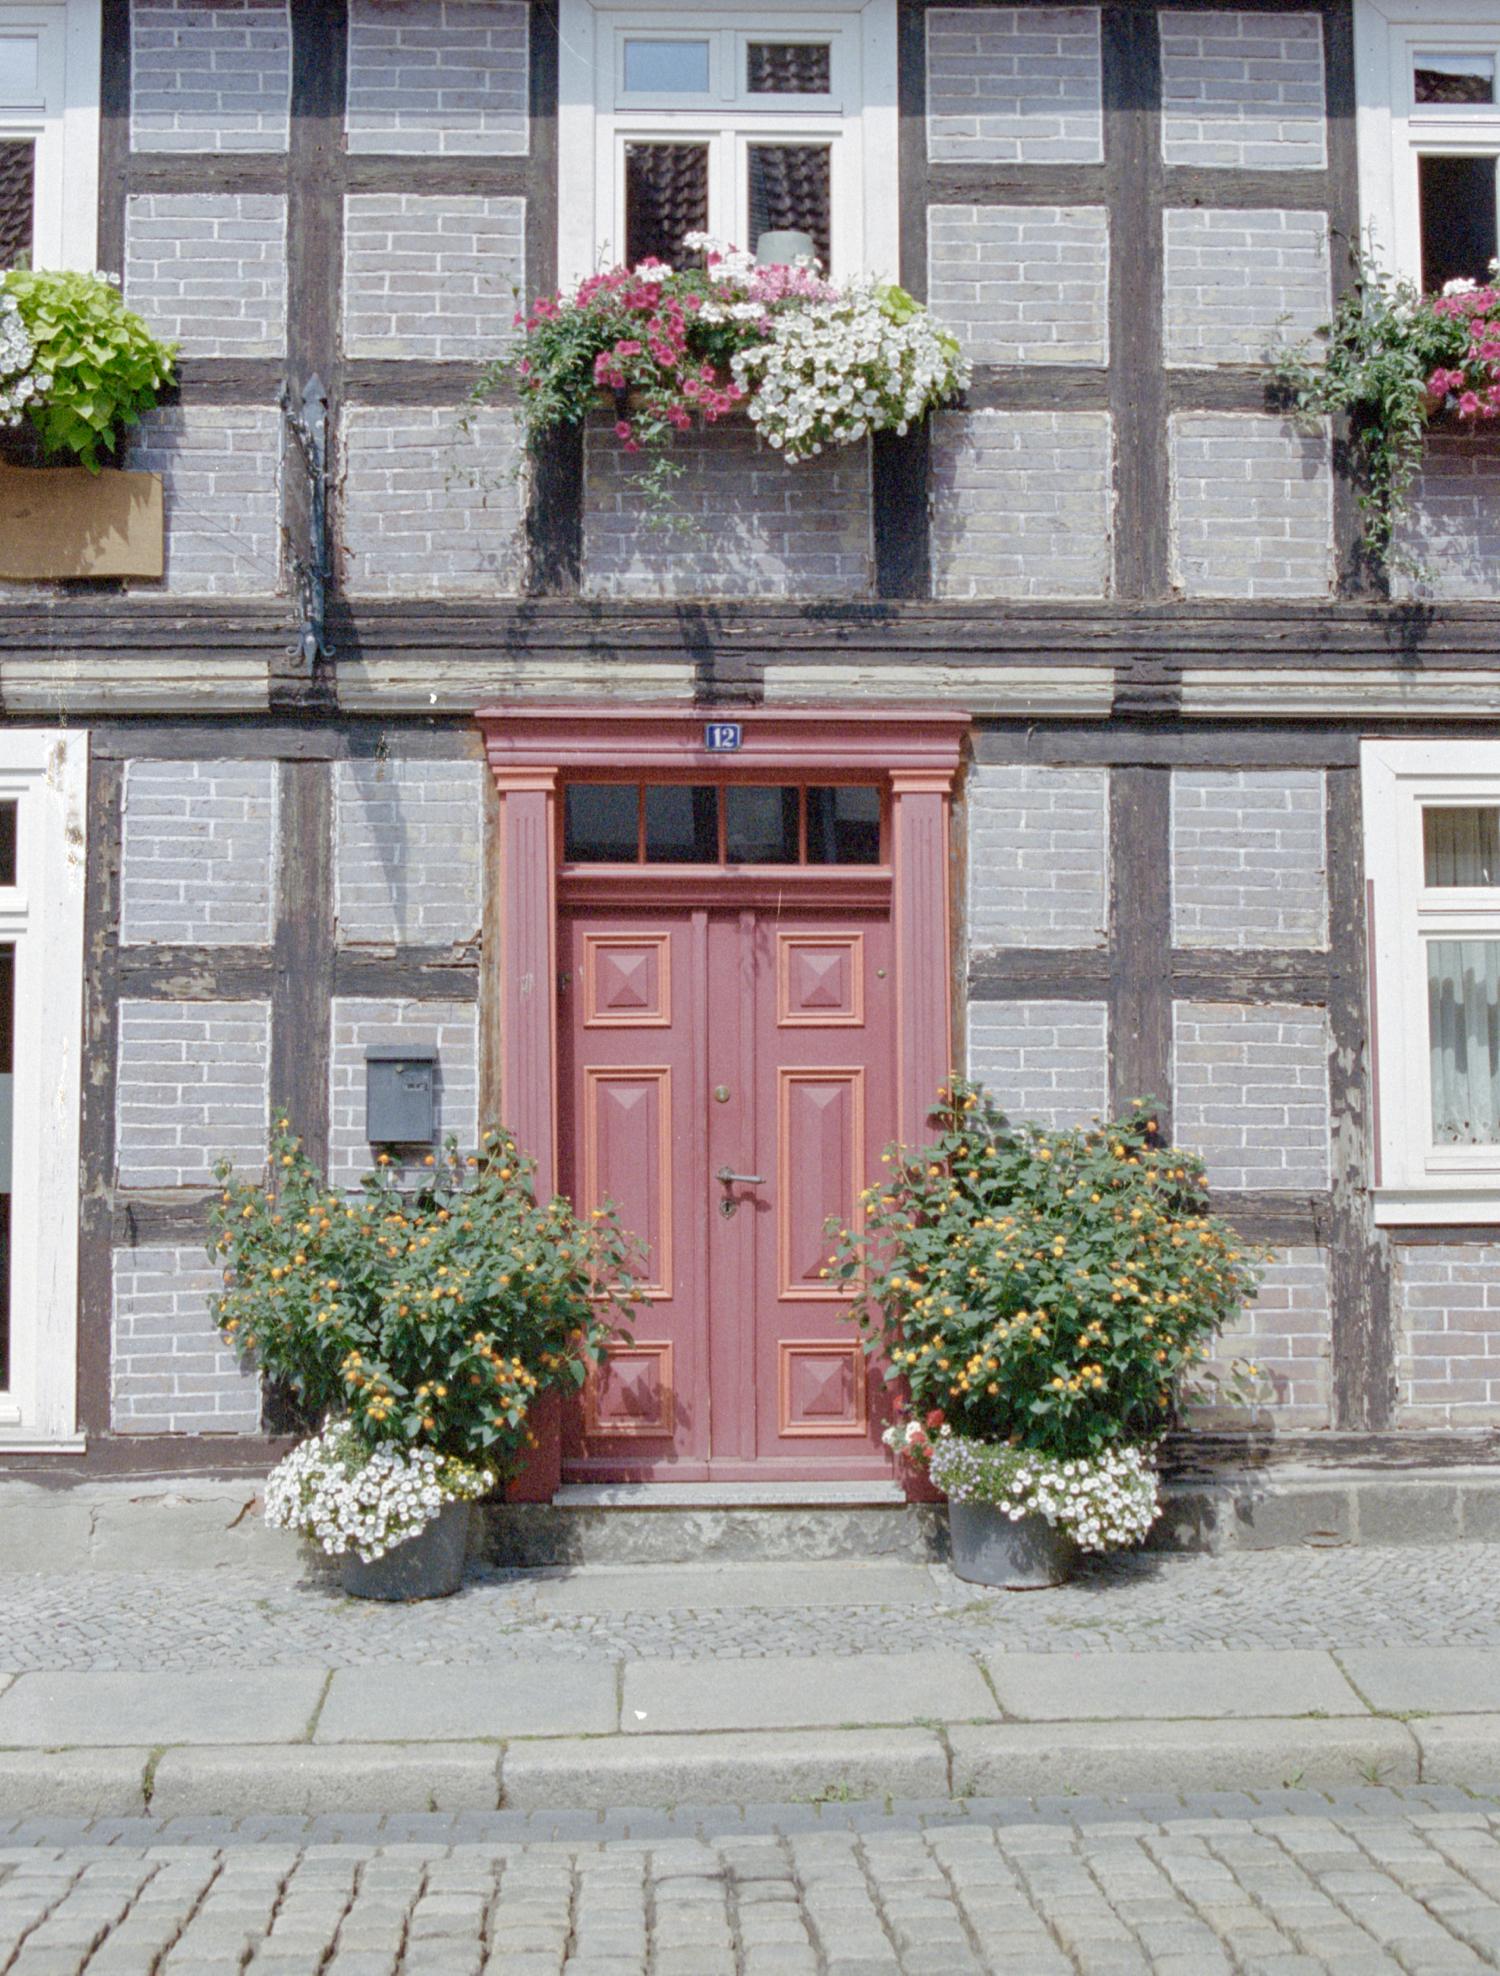 Wernigerode 08-2019 - 12 of 27